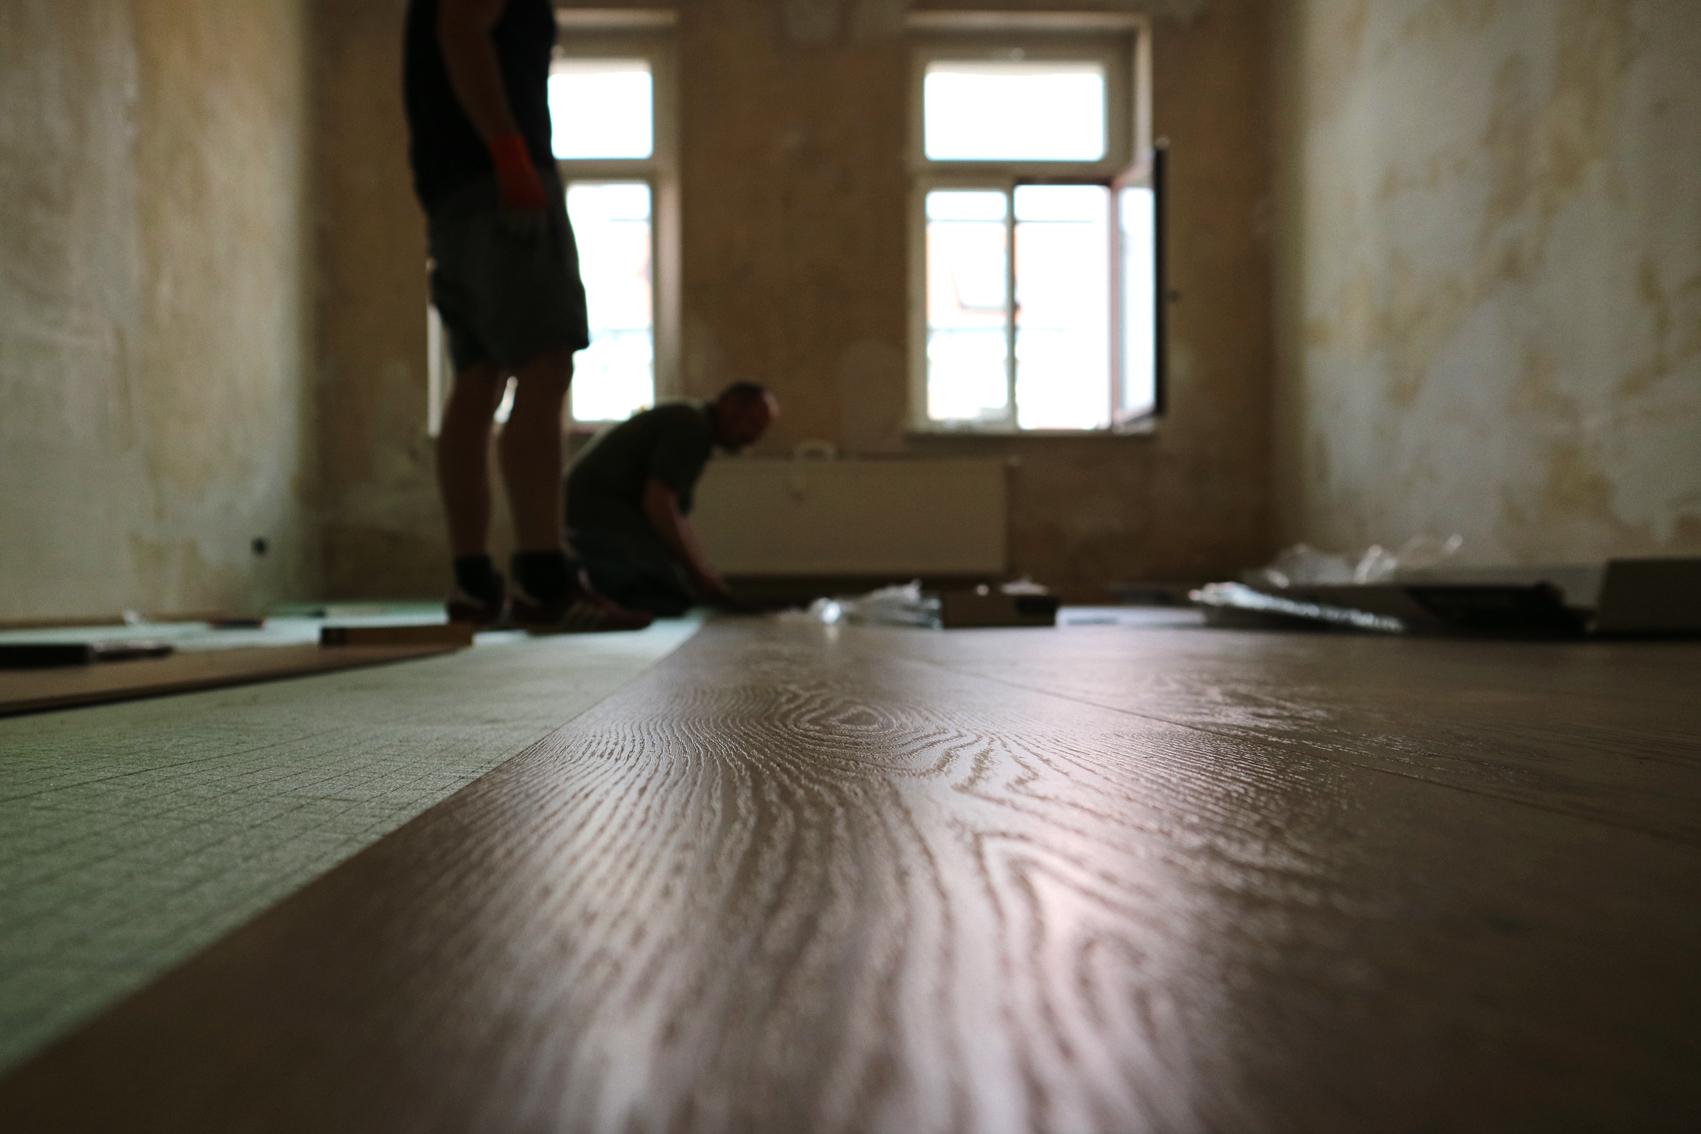 laminat-dielungsoptik-landhaus-verlegen